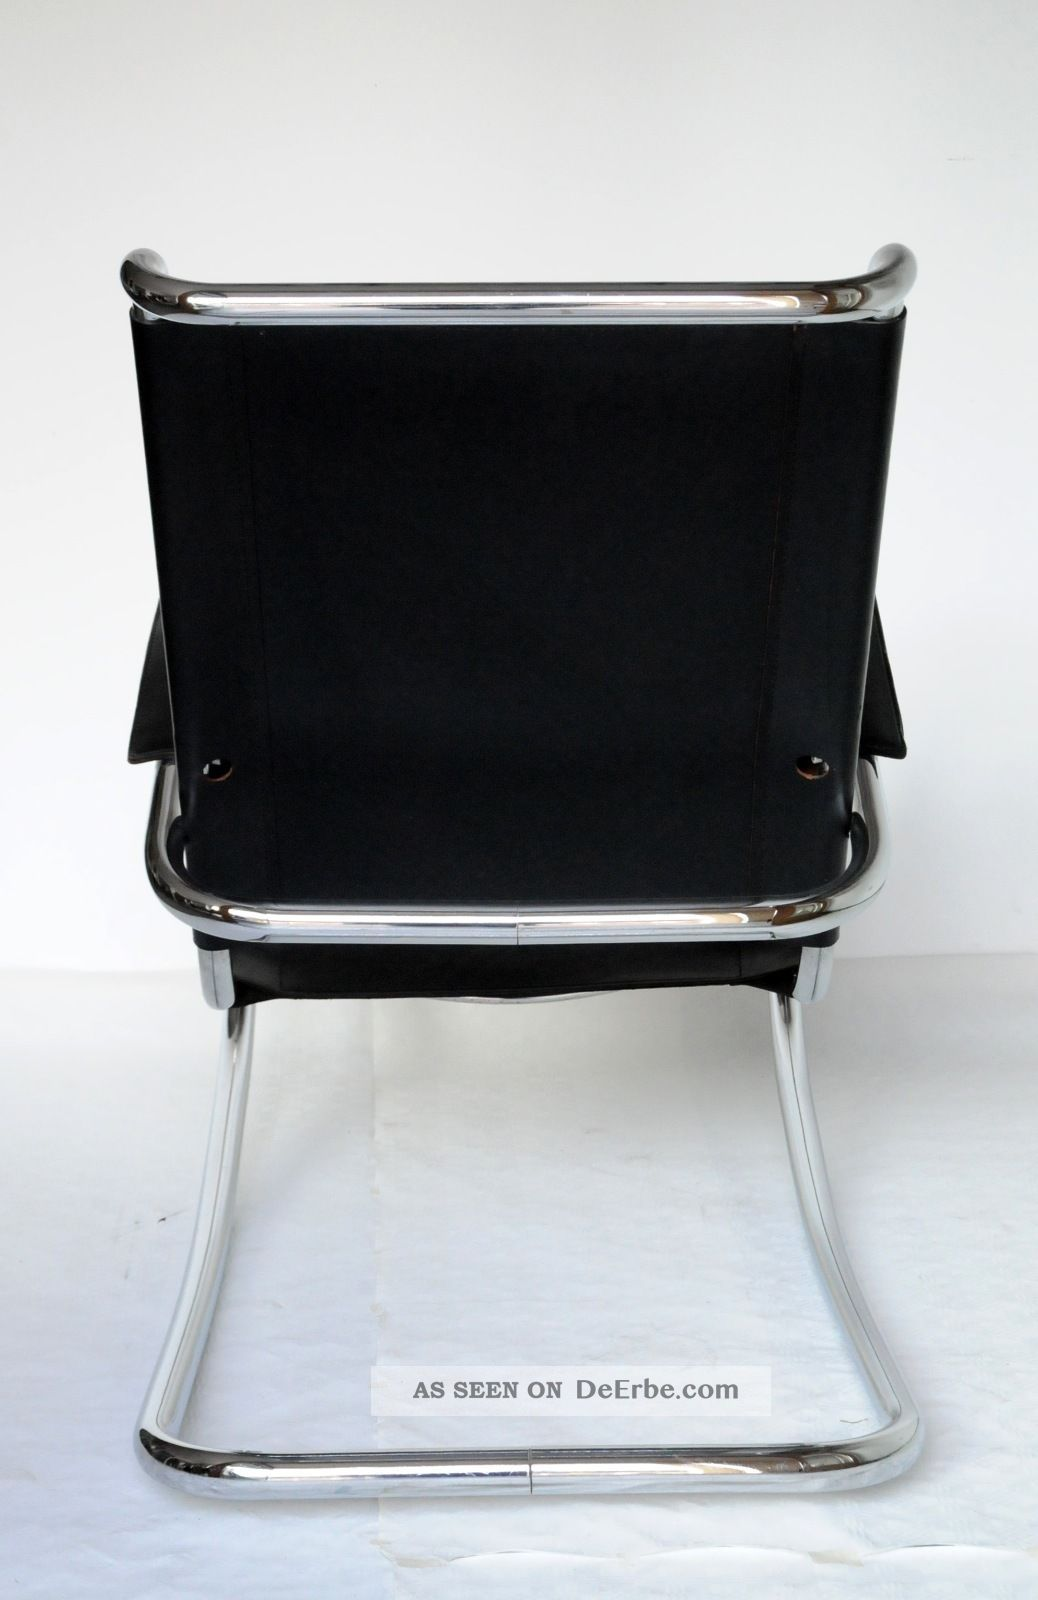 Sessel schaukelstuhl rocking chair stahlrohr leder schwarz for Sessel schaukelstuhl